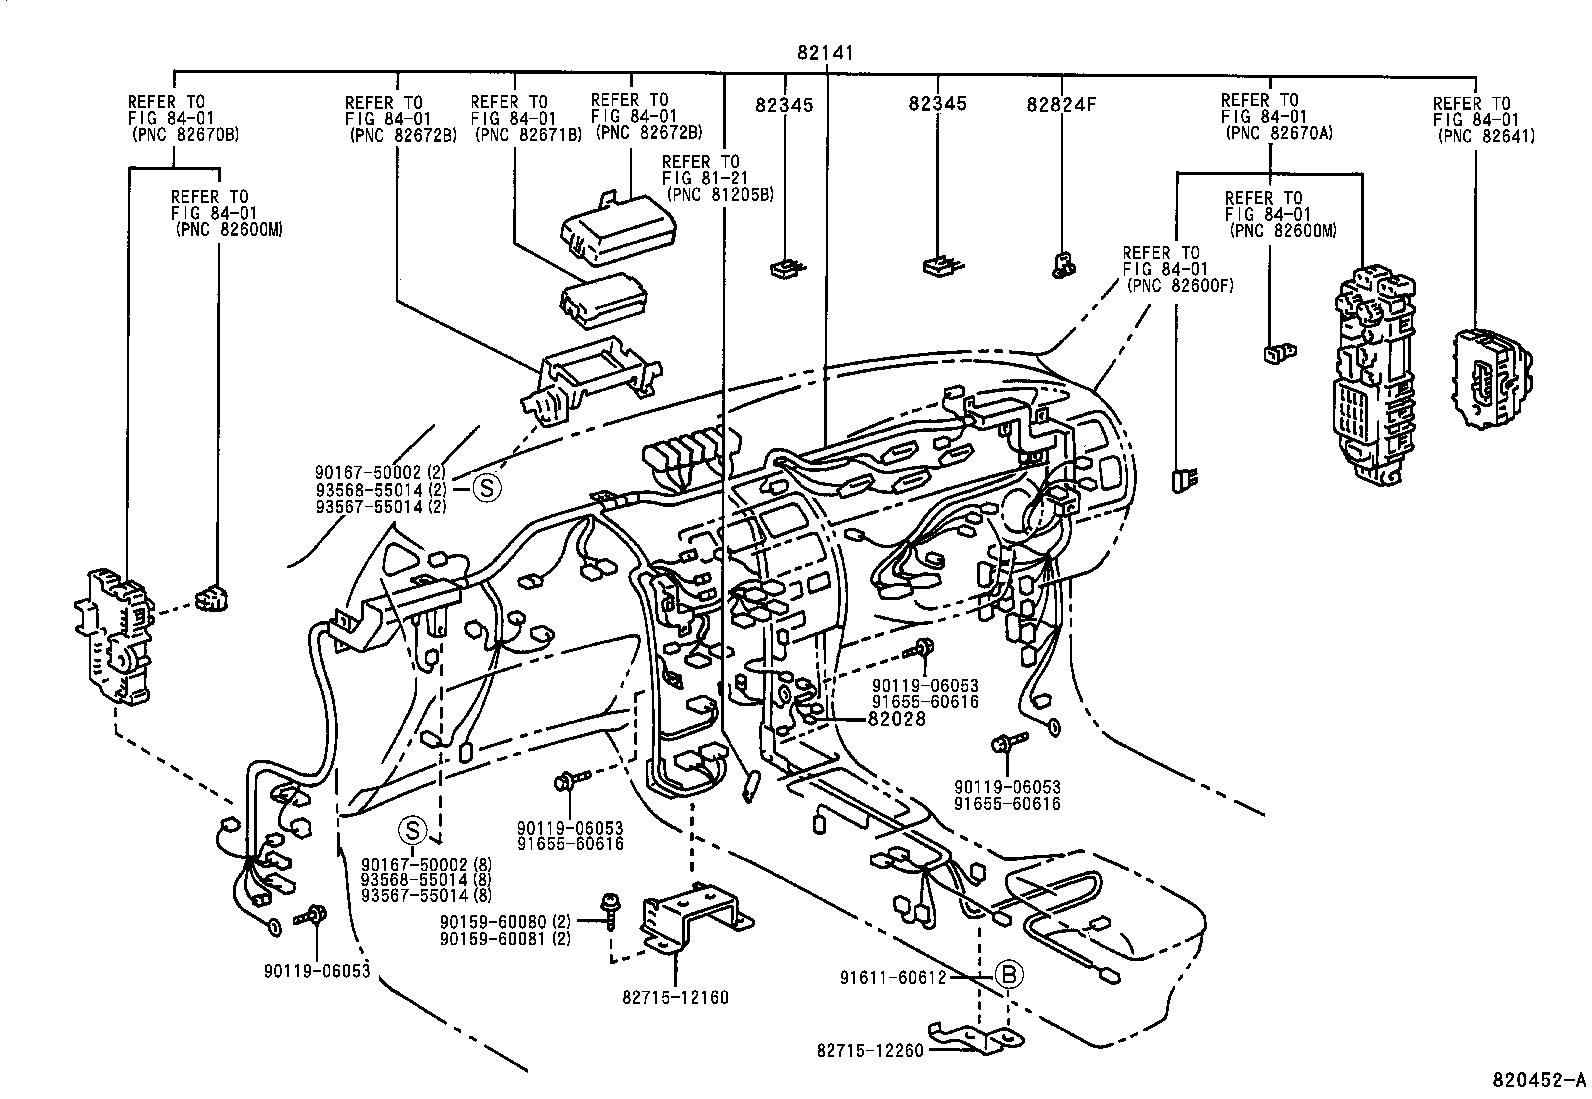 Toyota Dyna Electrical Diagram Toyota Dyna Electrical Diagram Toyota